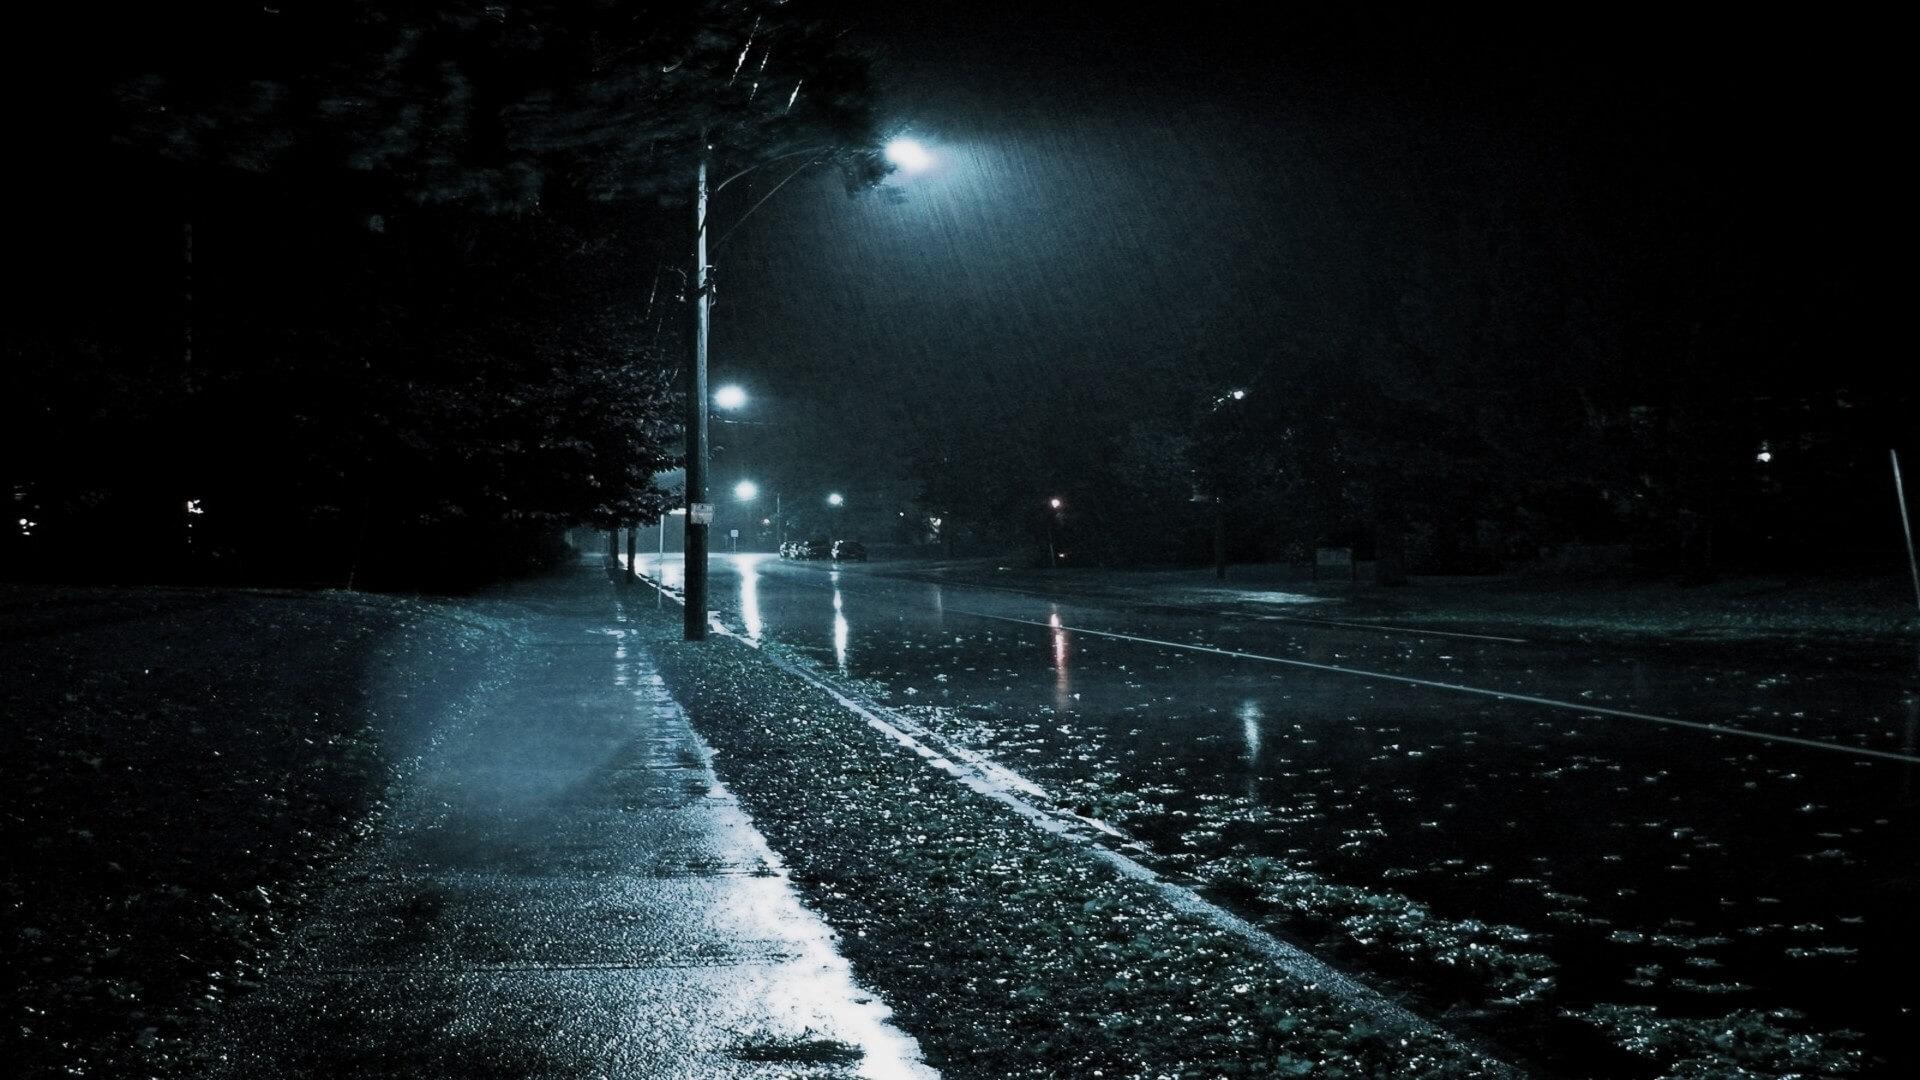 Rainy-Road-Night-Wallpaper (1)